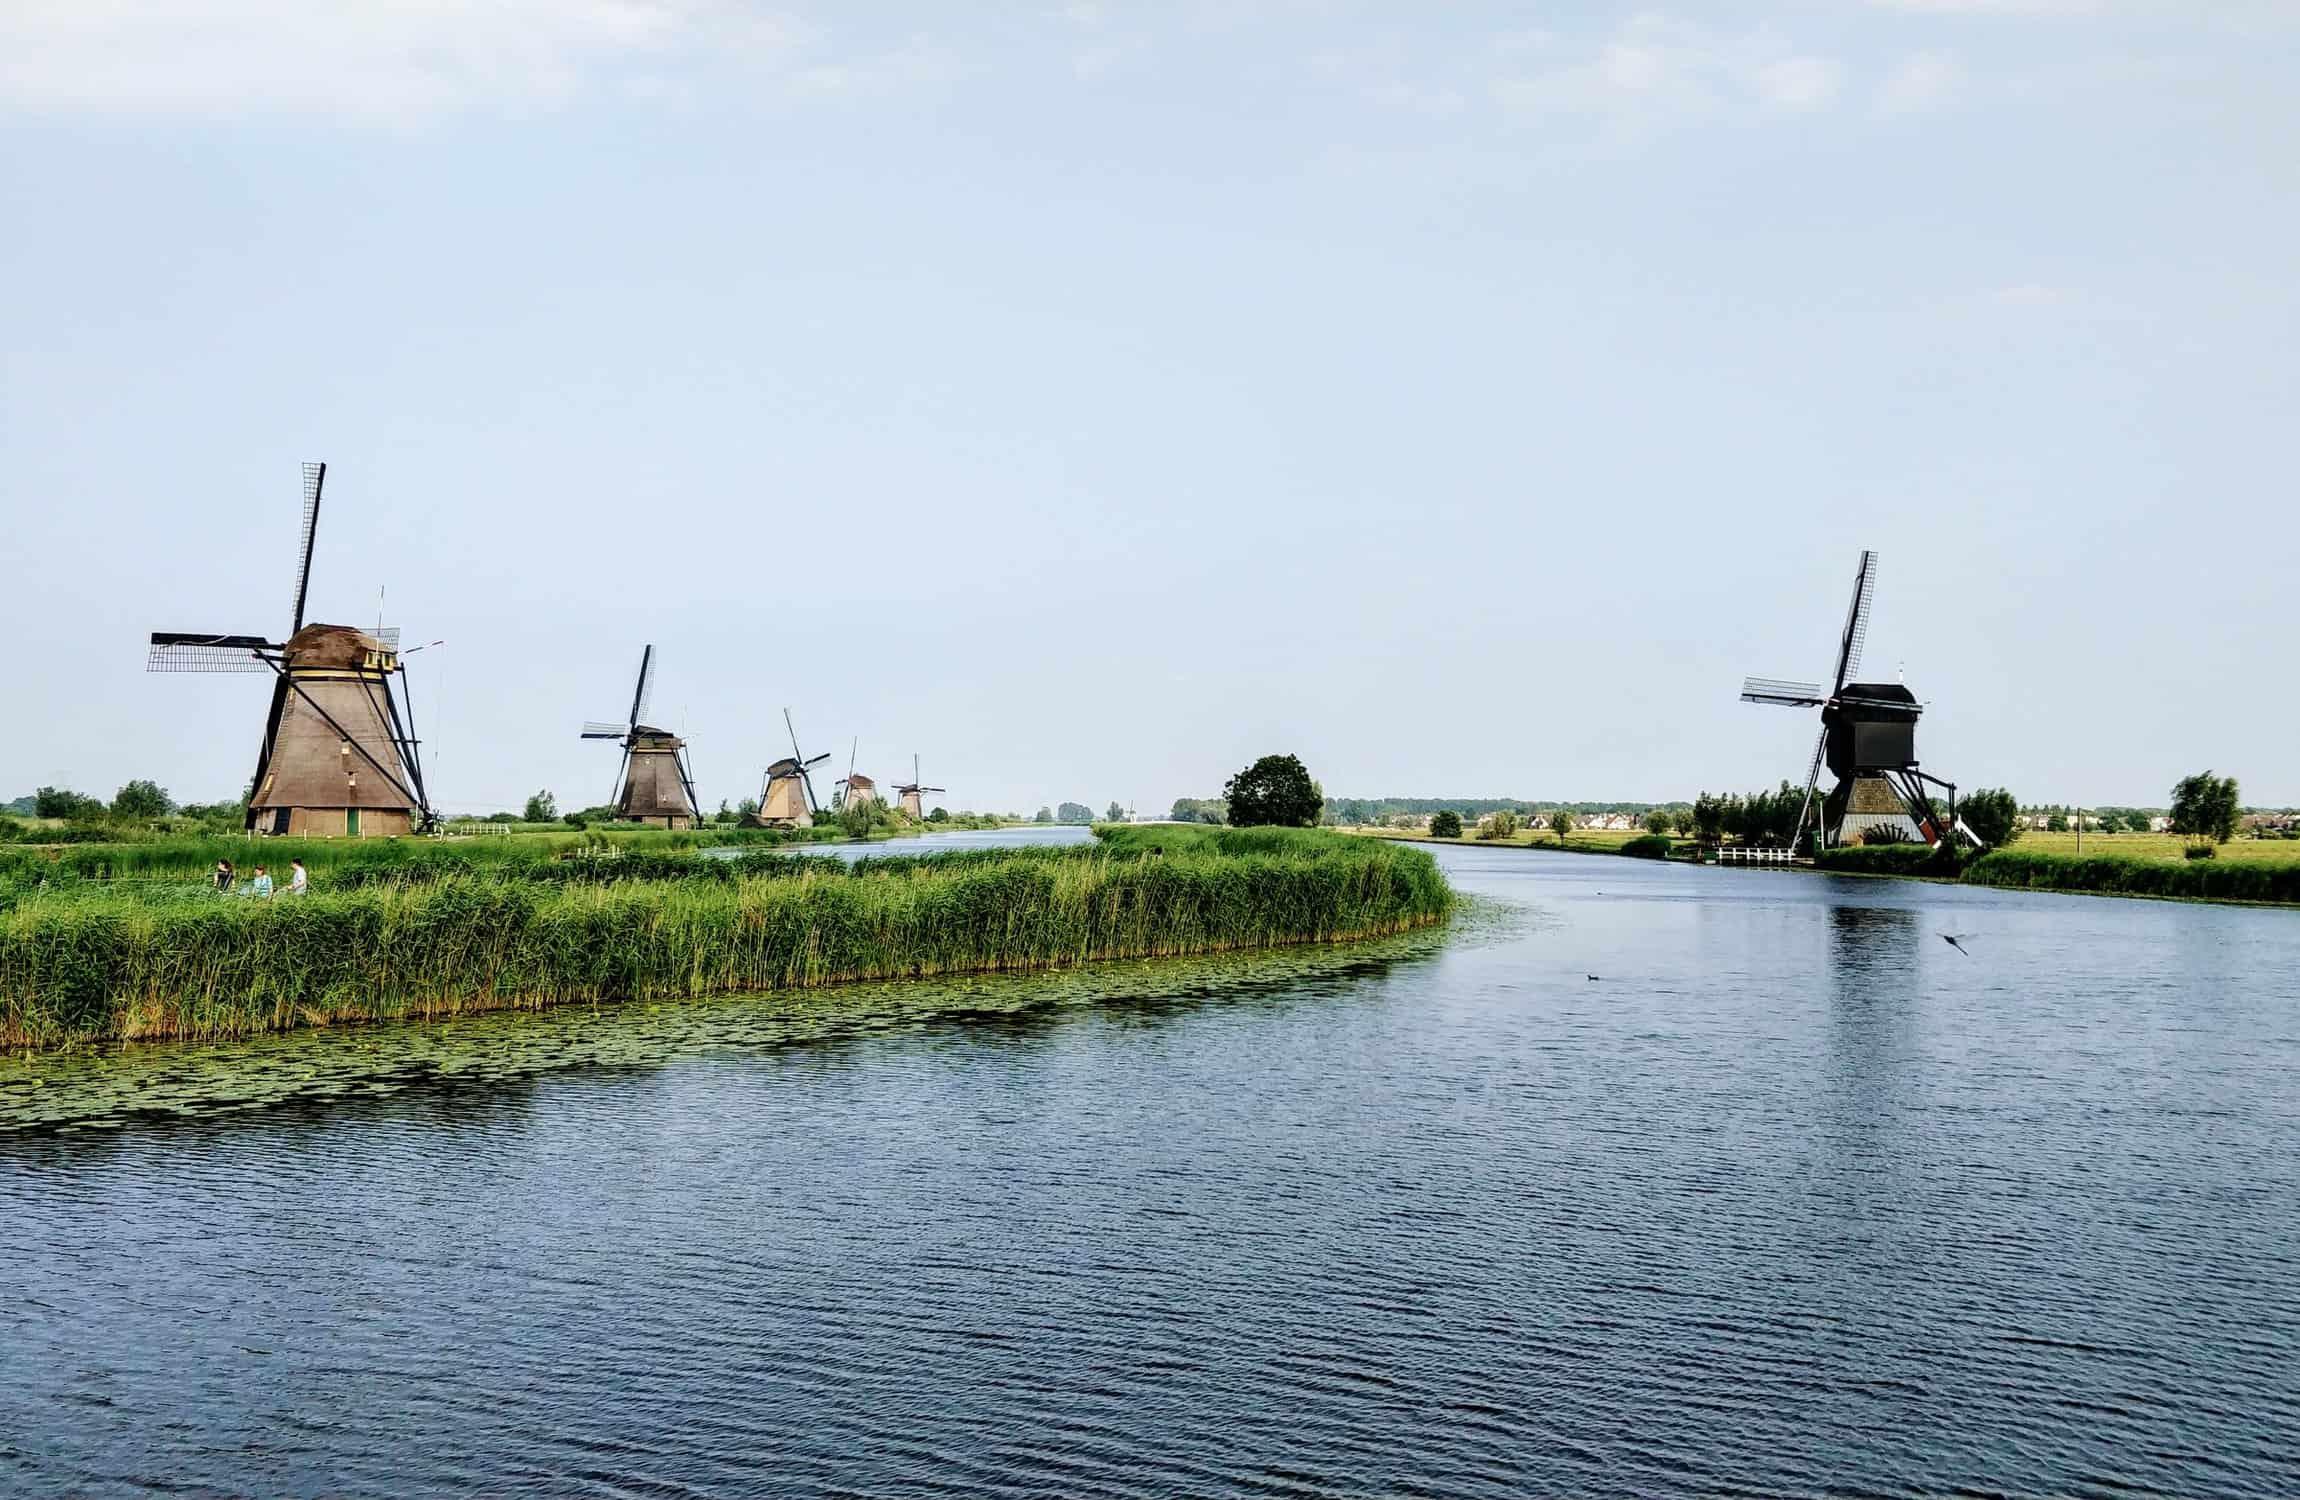 Vegan reisen in den Niederlanden